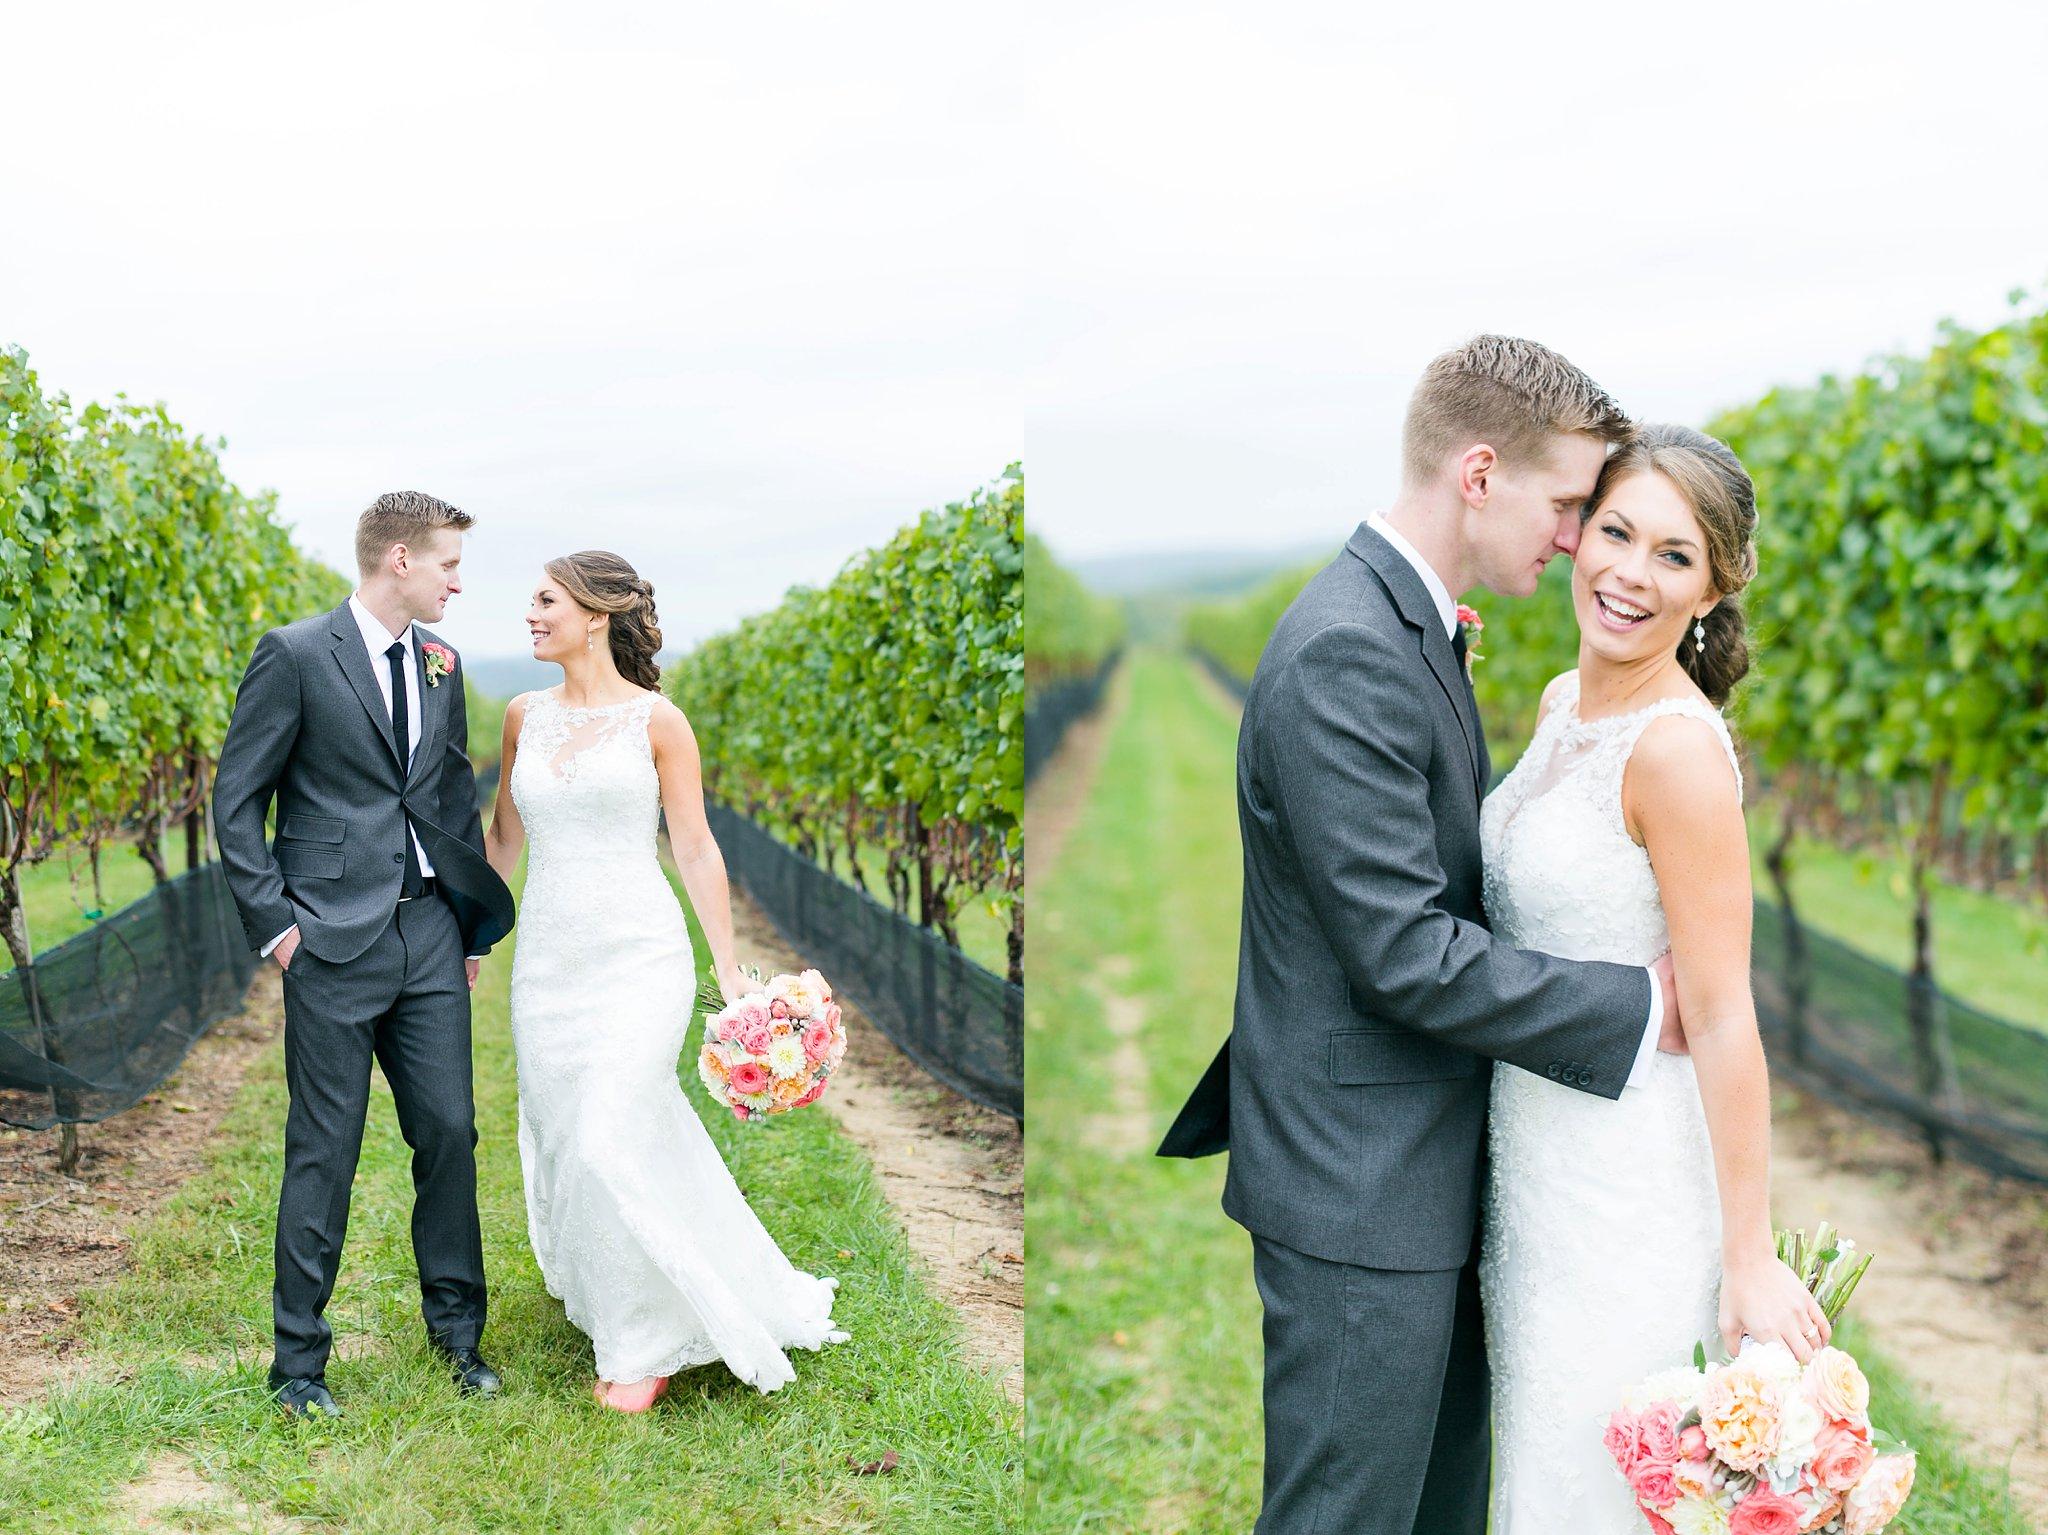 Stone Tower Winery Wedding Photos Virginia Wedding Photographer Megan Kelsey Photography Sam & Angela-215.jpg